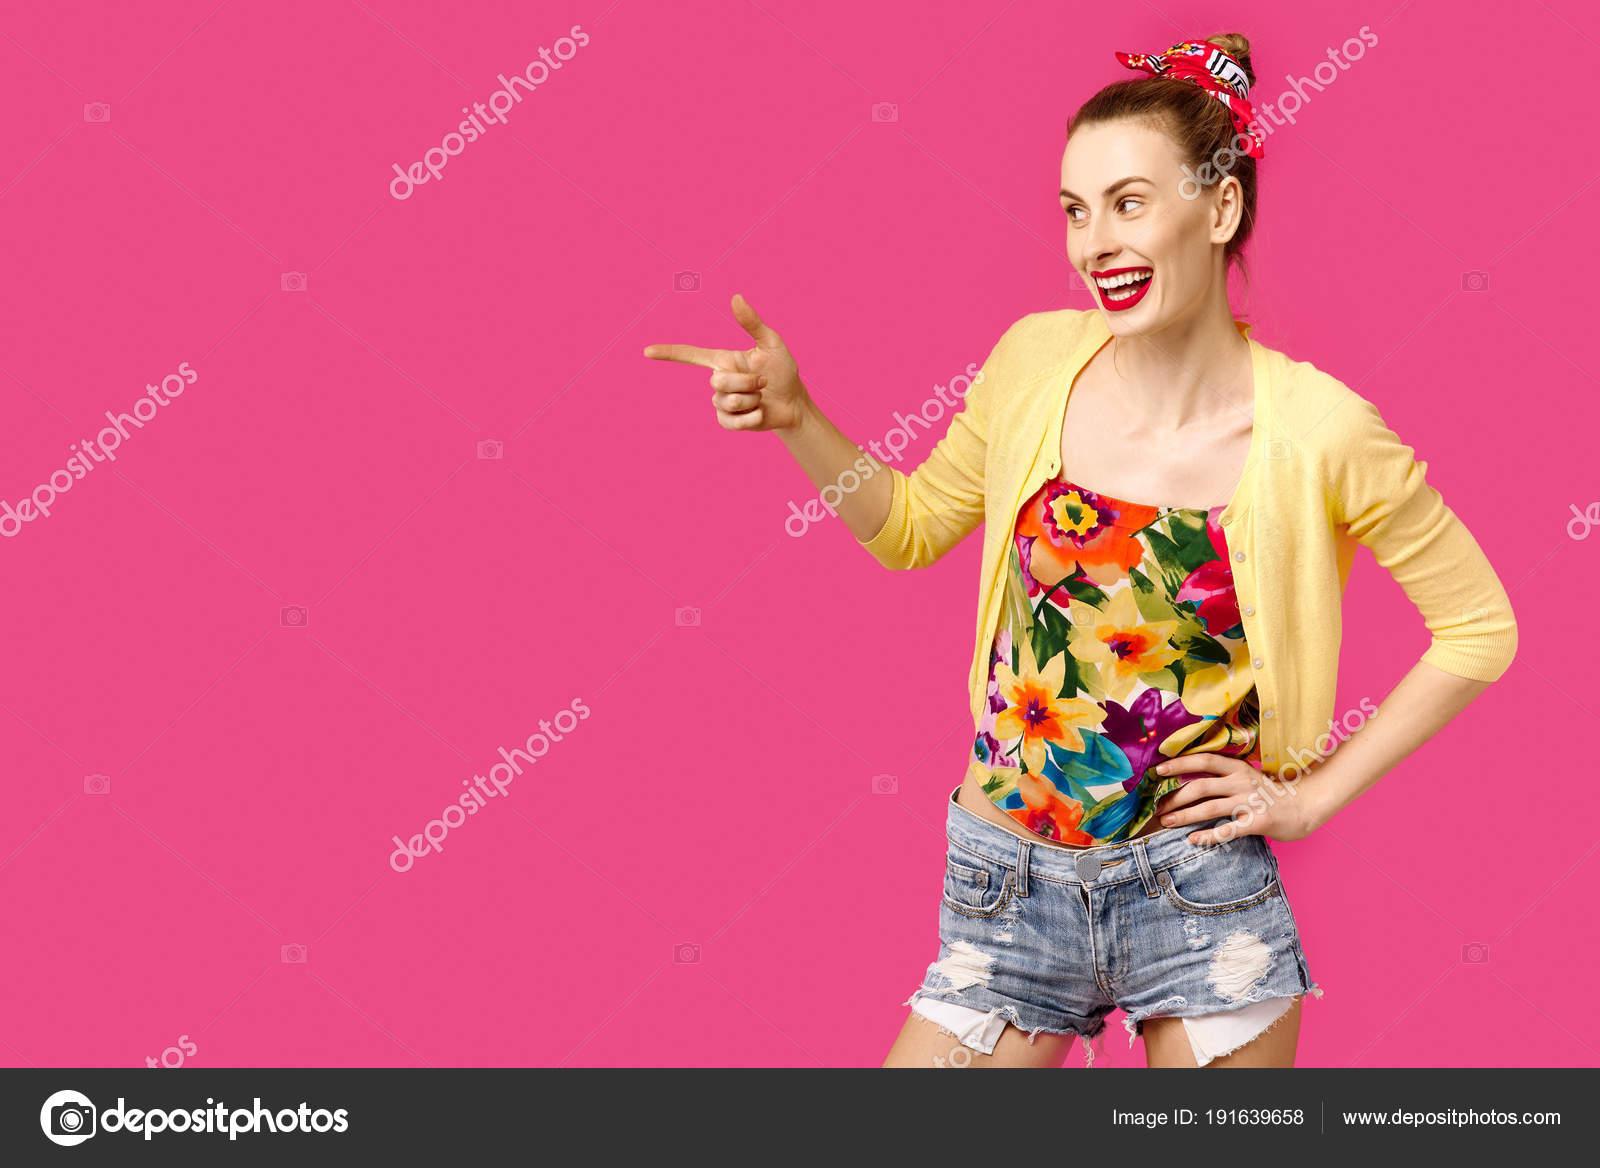 72a4da8470d Krásná mladá dívka v žlutém svetru na růžovém pozadí zobrazuje ok. Barevný  koncept posedlost. Minimalistický styl